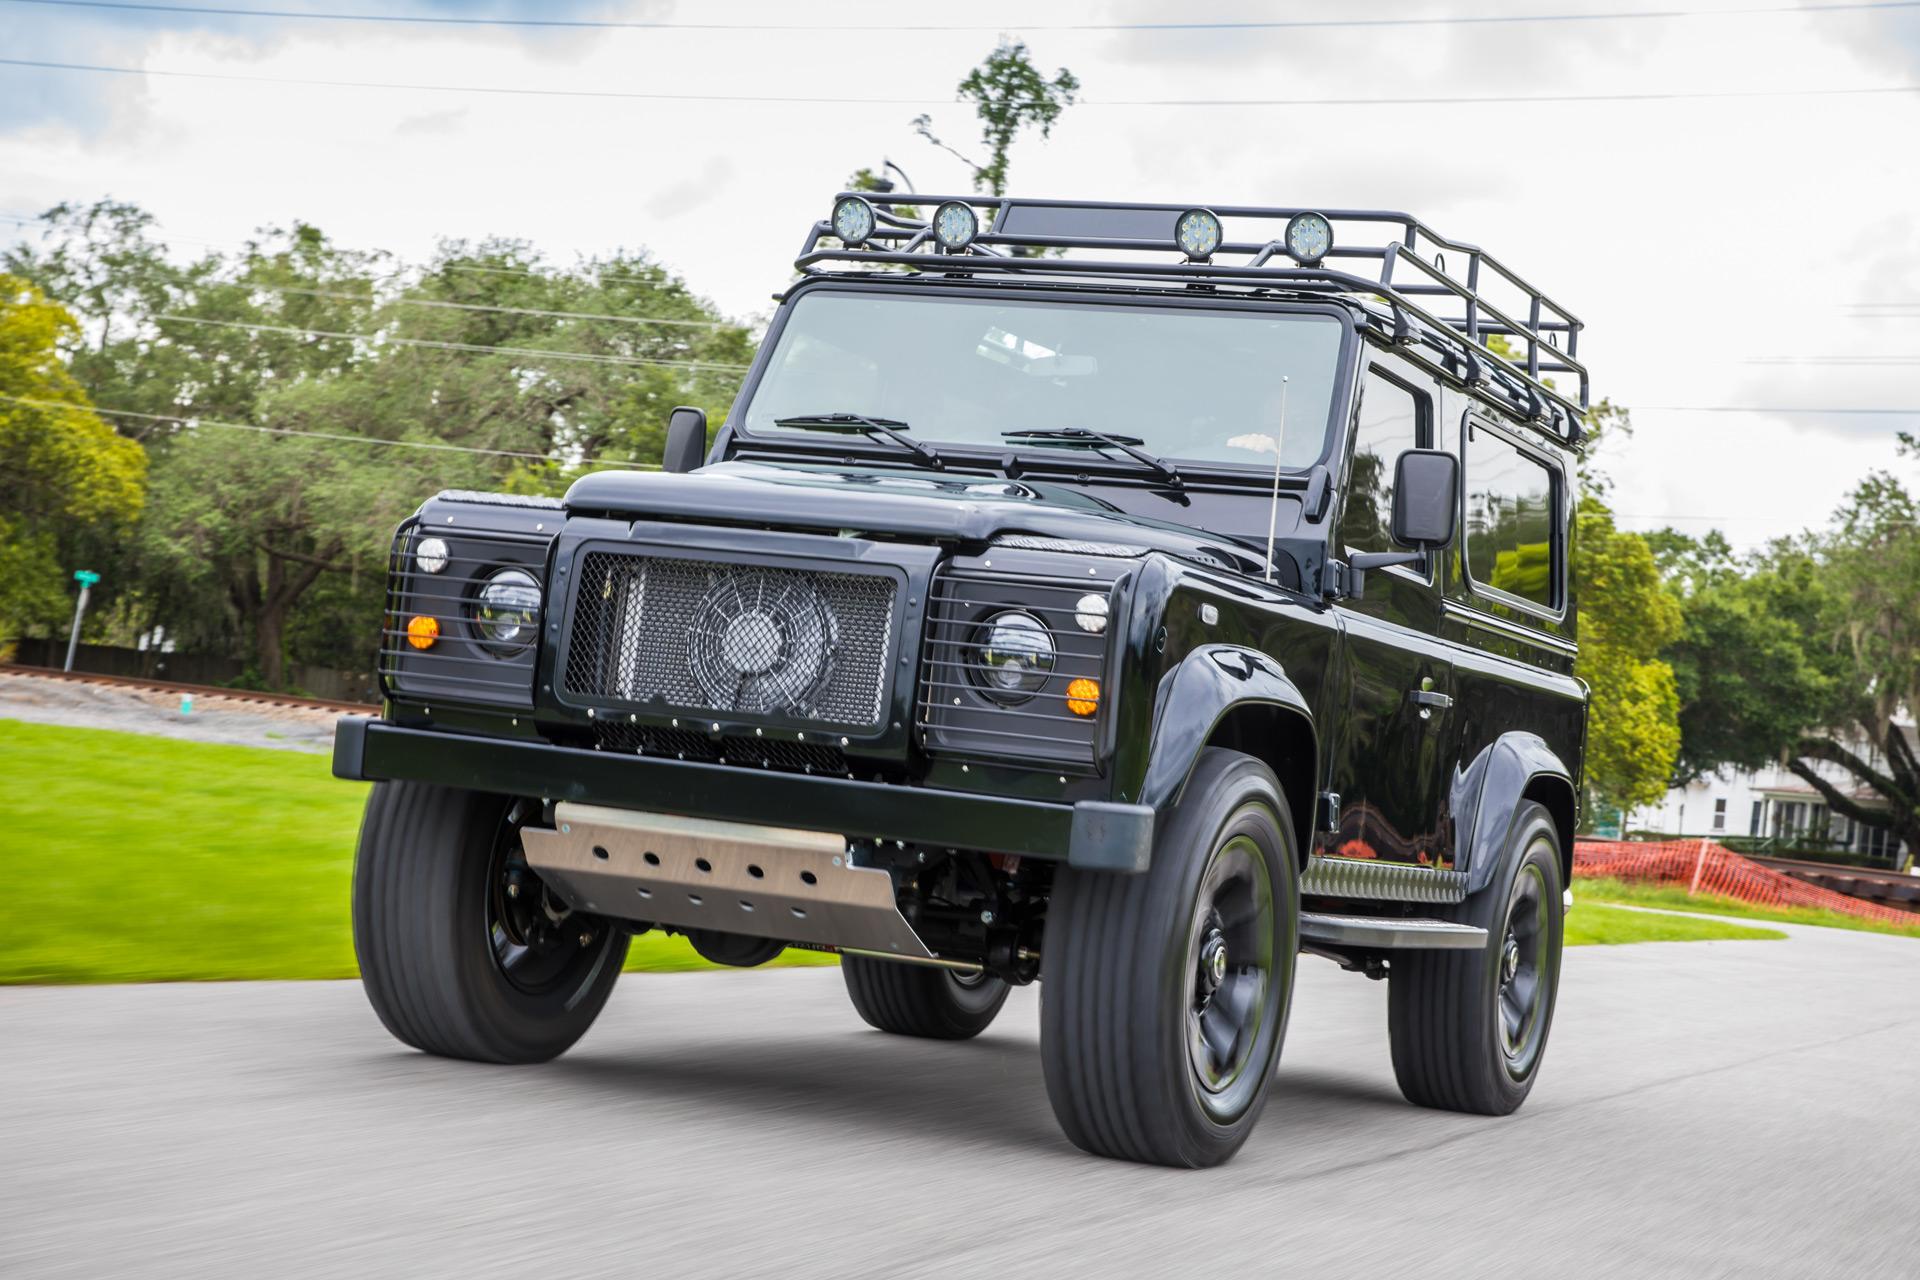 Land Rover Defender For Sale East Coast